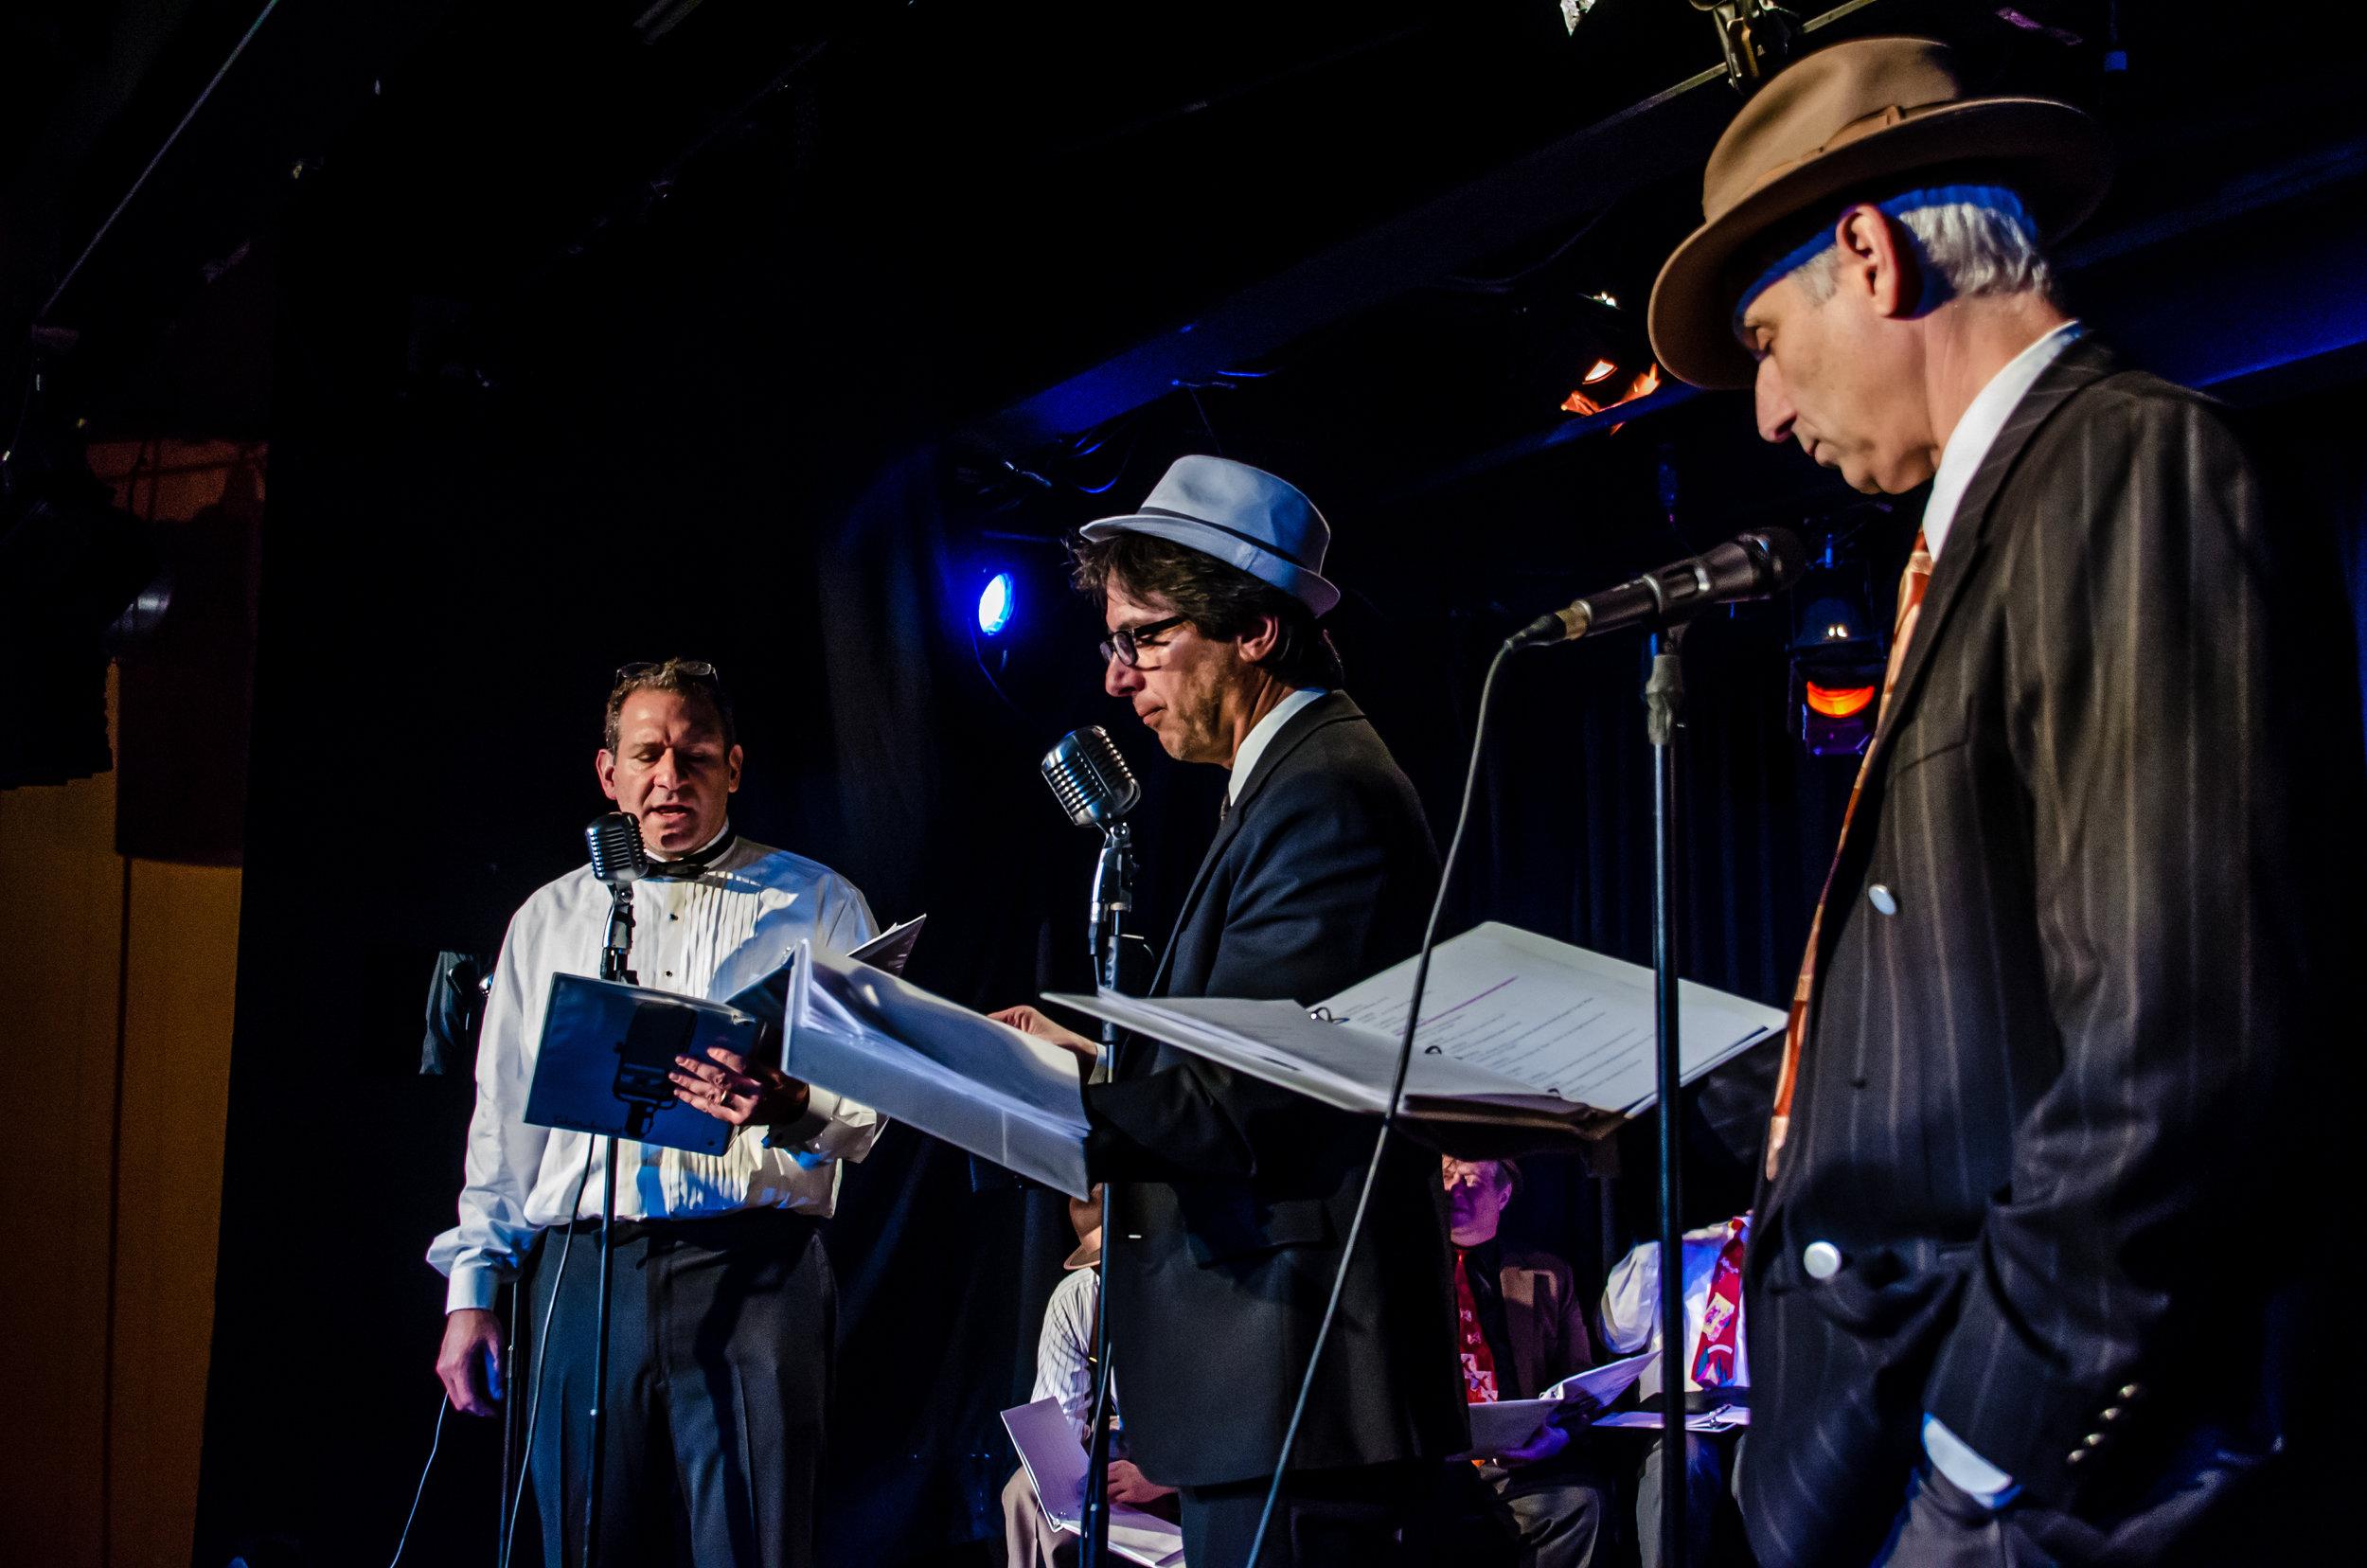 Emmy winner Ray Romano joins David Koff & Dan Kinsella on stage